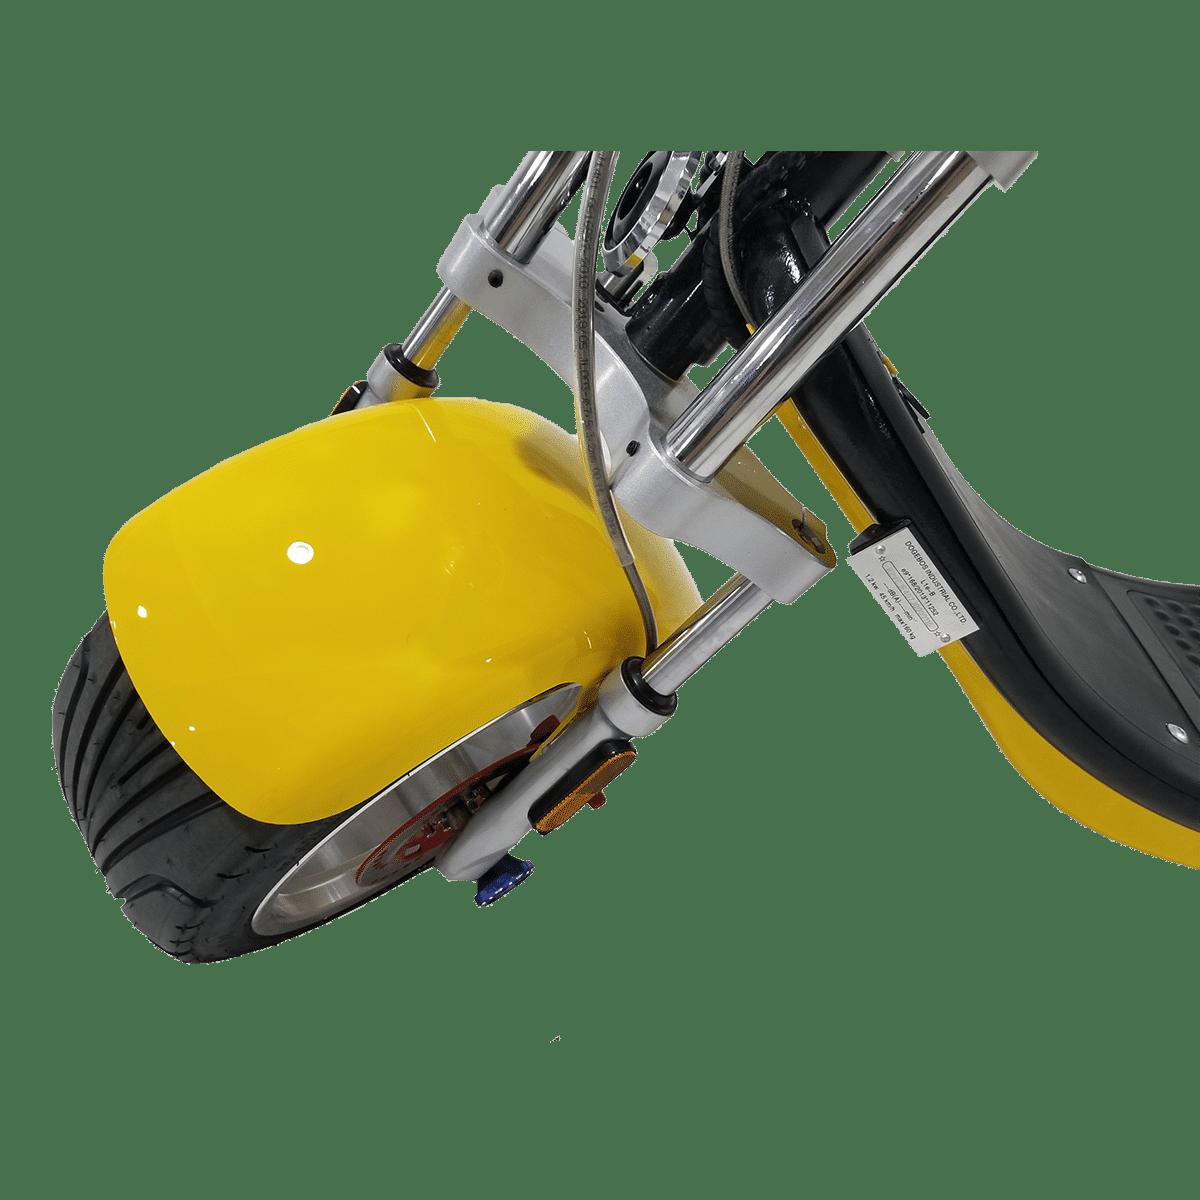 Citycoco Harley Deluxe Jaune avec 1 batterie offerte en plus 9